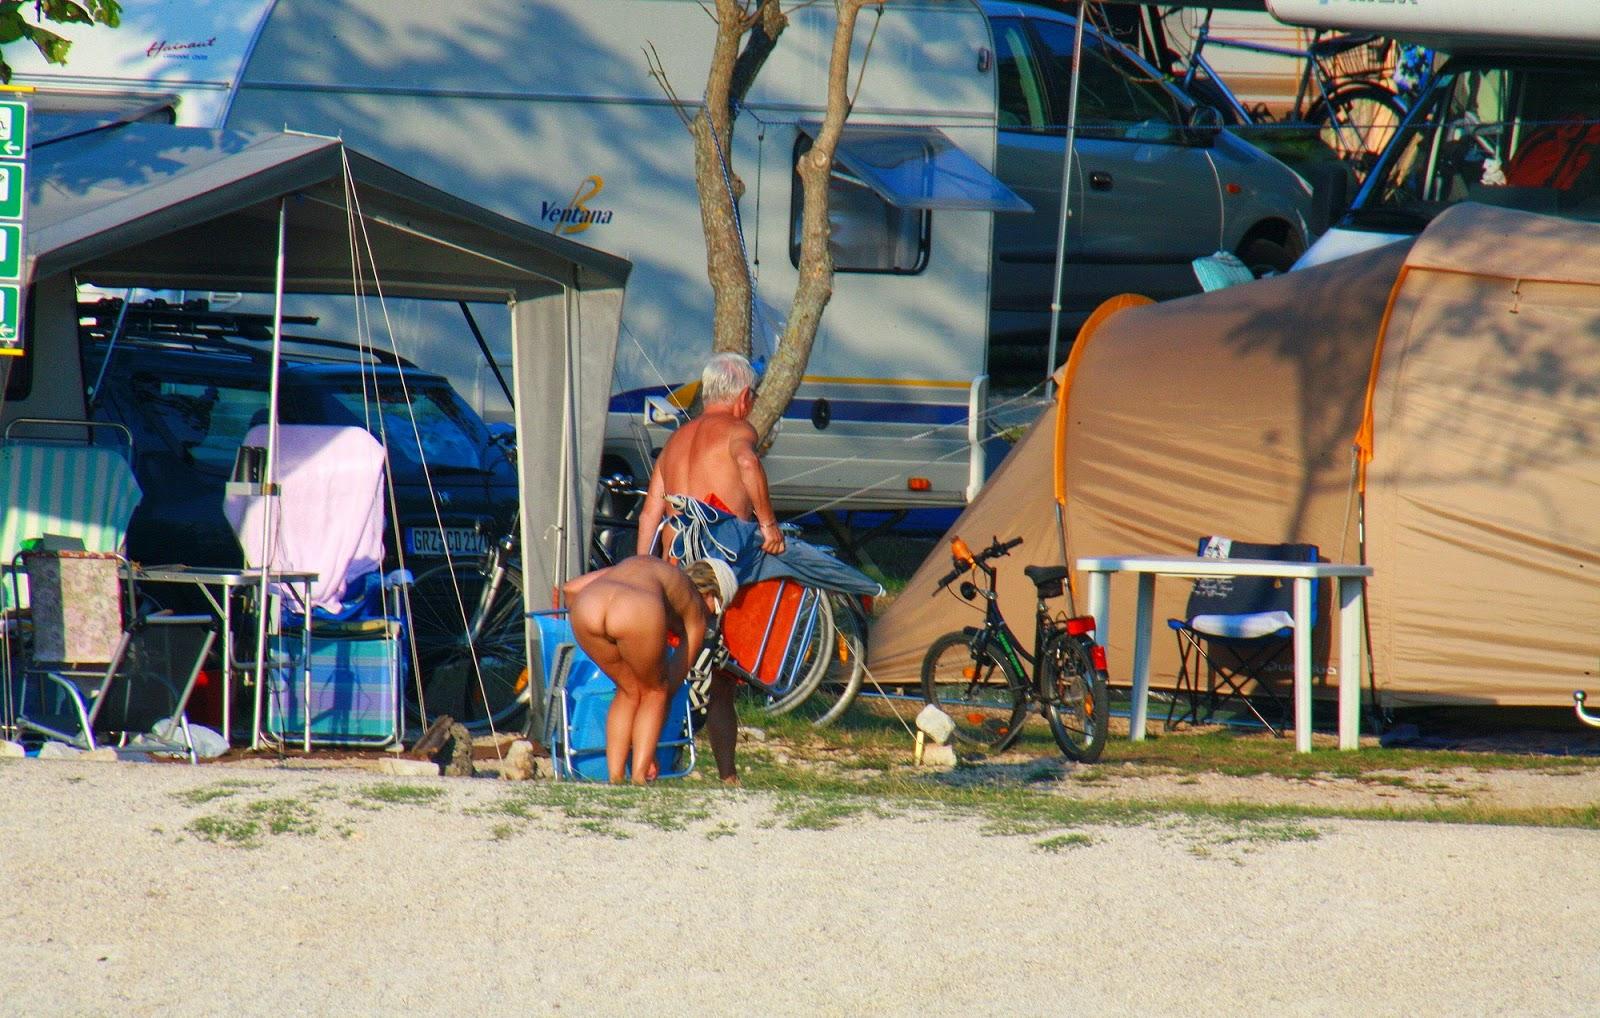 fkk camping sex richtige selbstbefriedigung